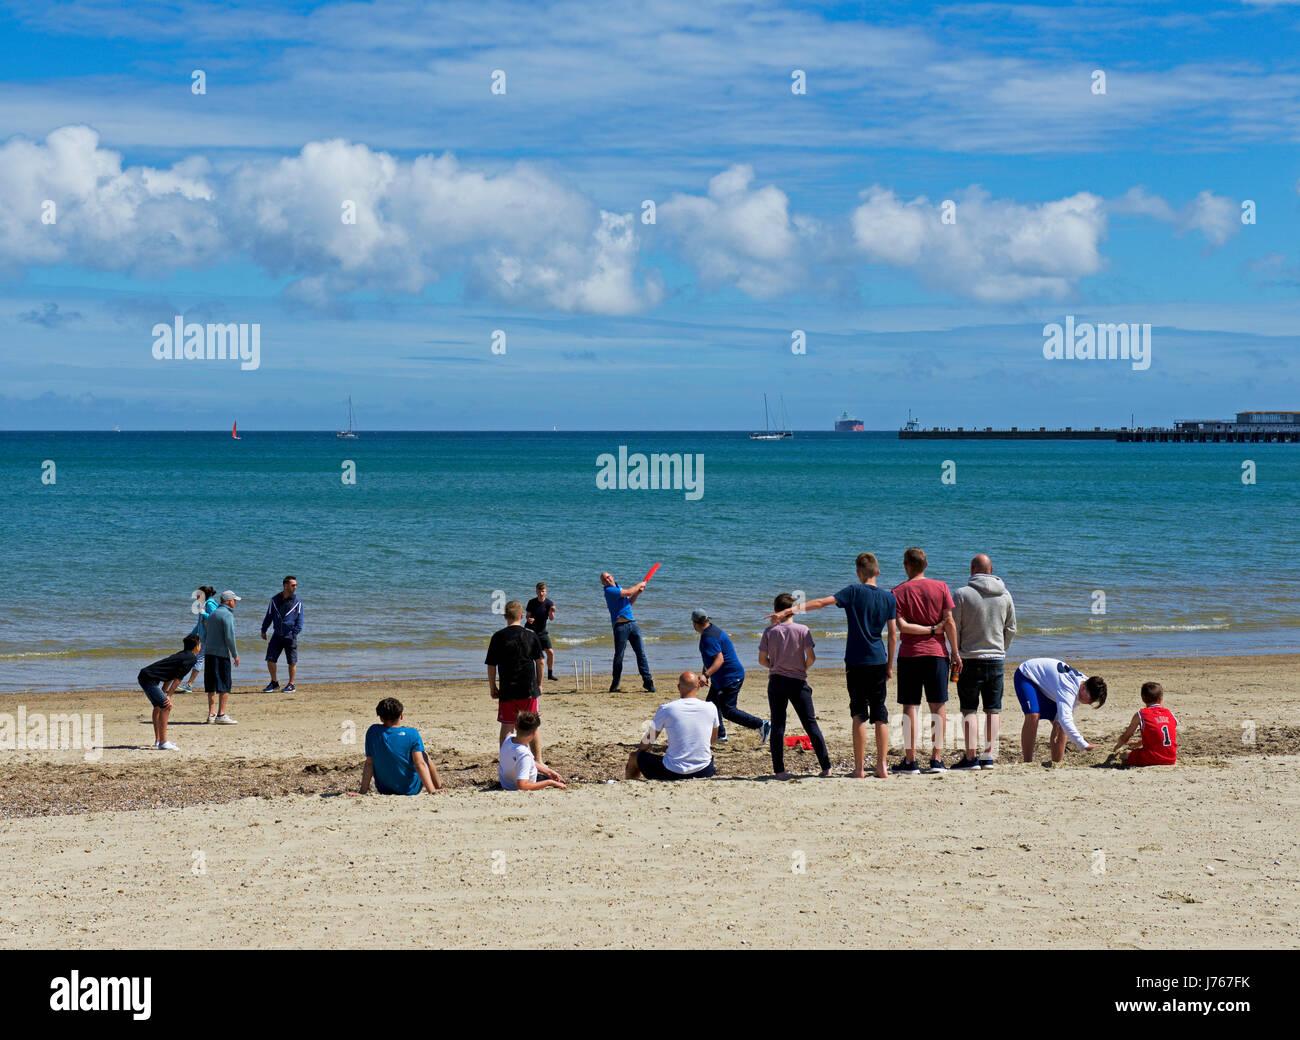 Cricket on the beach at Weymouth, Dorset, England UK - Stock Image